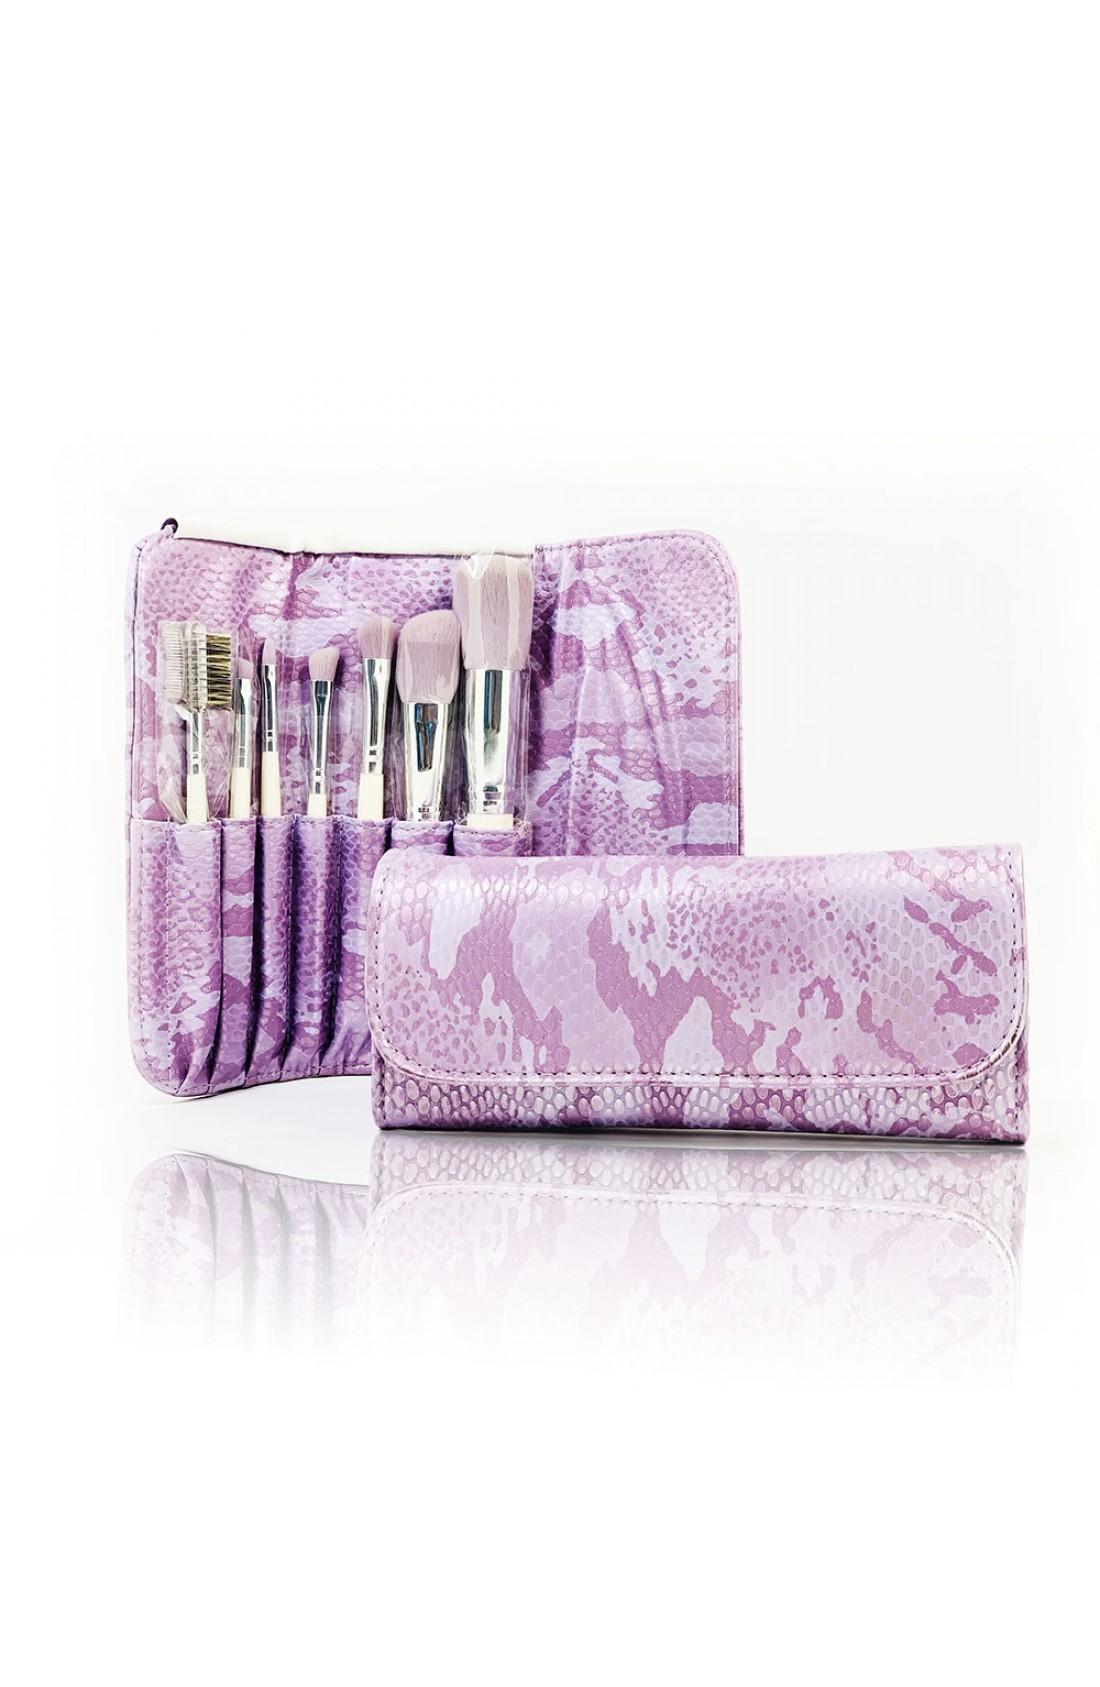 Cosmetic Makeup Brush Set + Purse